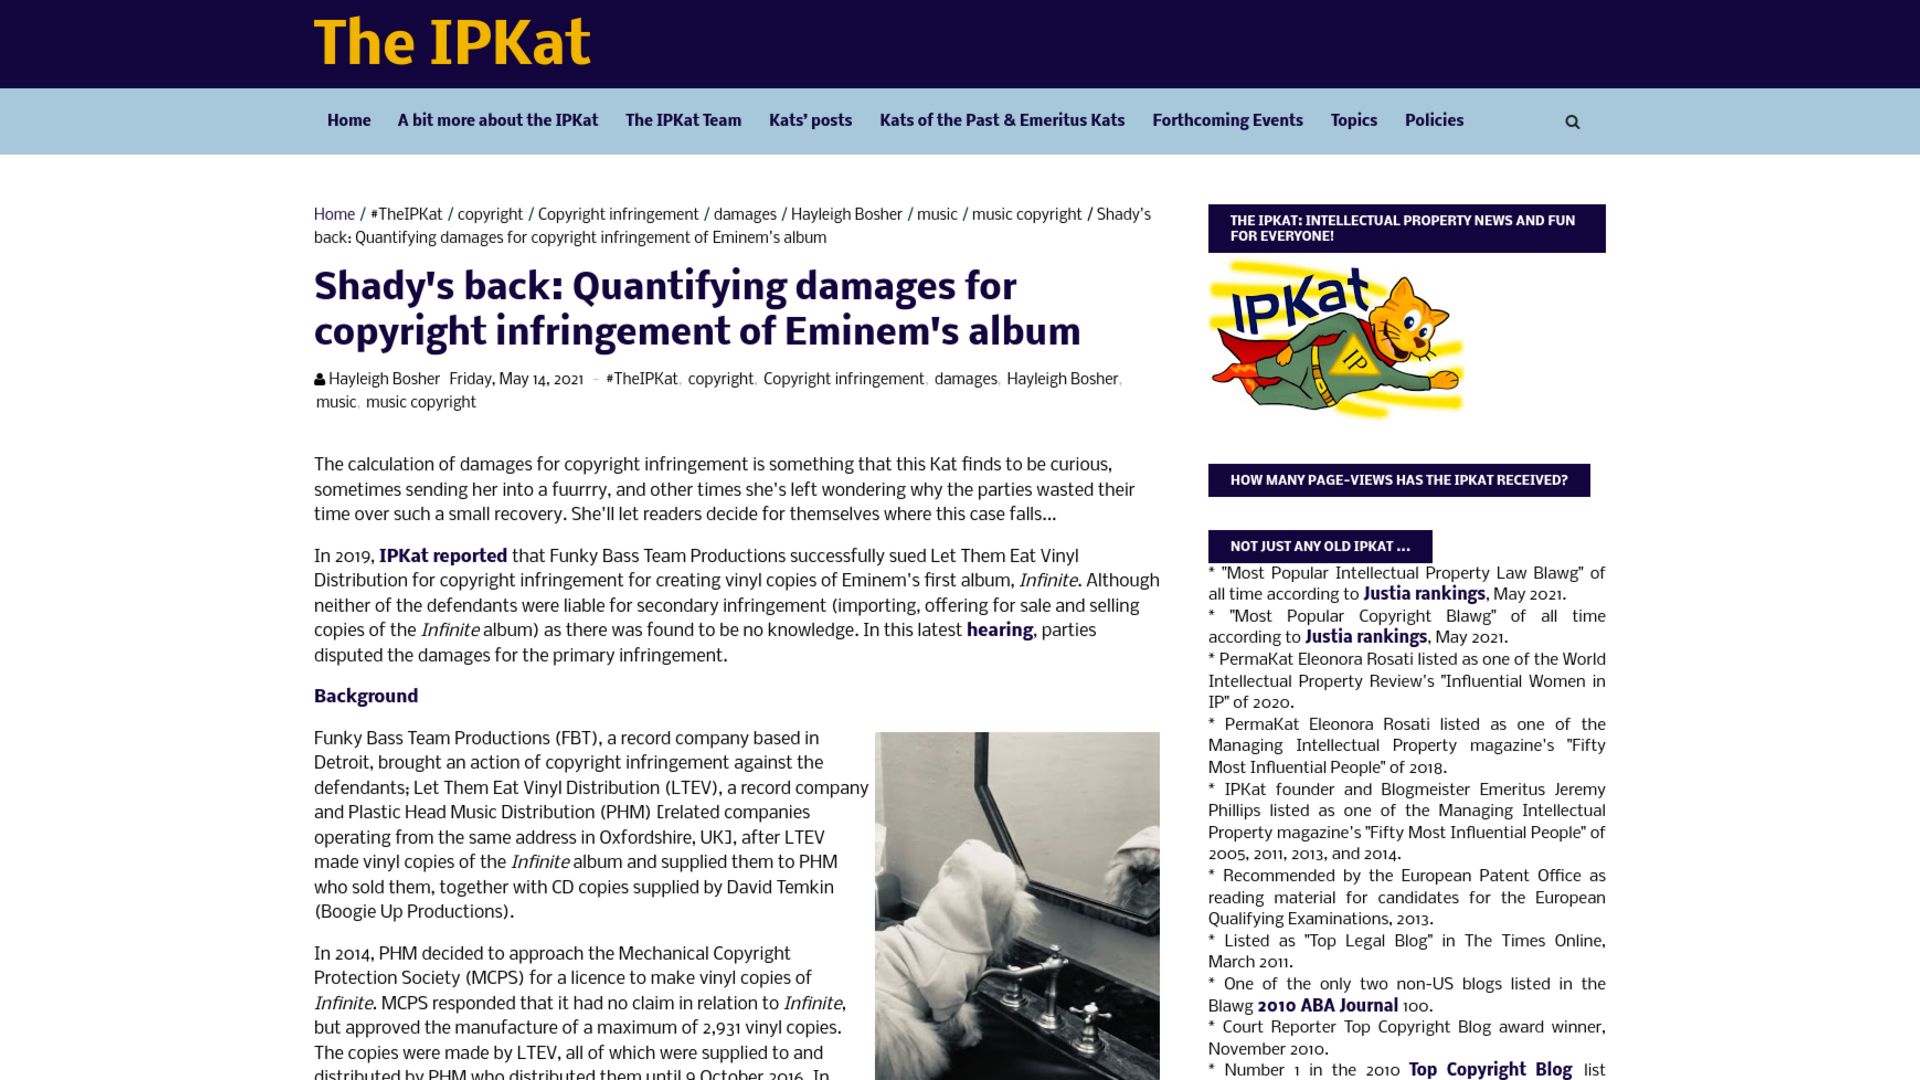 Fairness Rocks News Shady's back: Quantifying damages for copyright infringement of Eminem's album